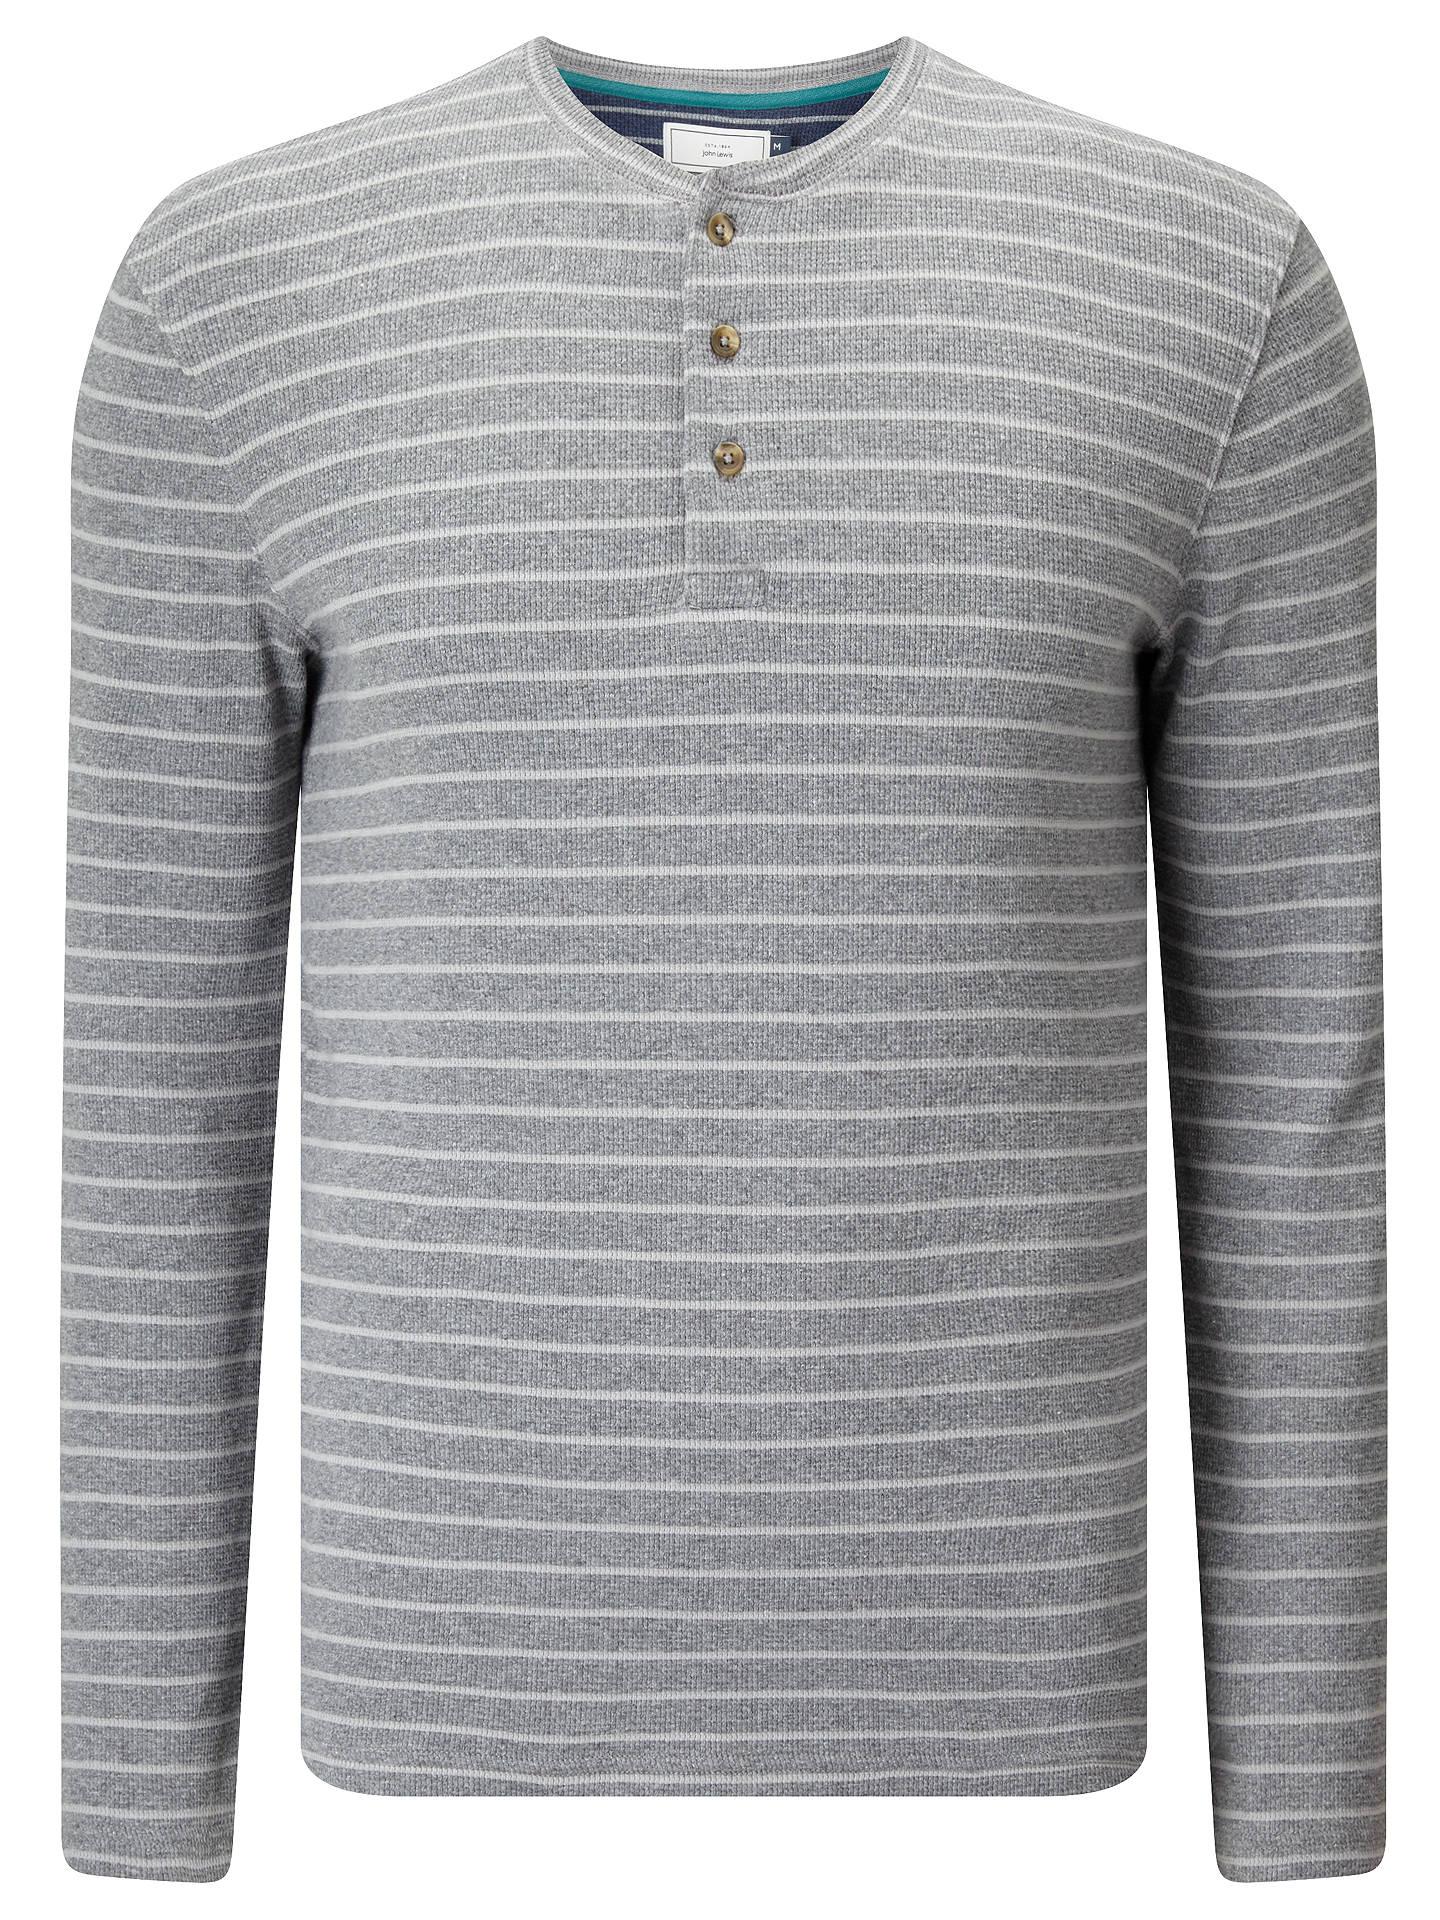 18661469d40e ... Buy John Lewis Stripe Waffle Henley Shirt, Grey, S Online at johnlewis.com  ...